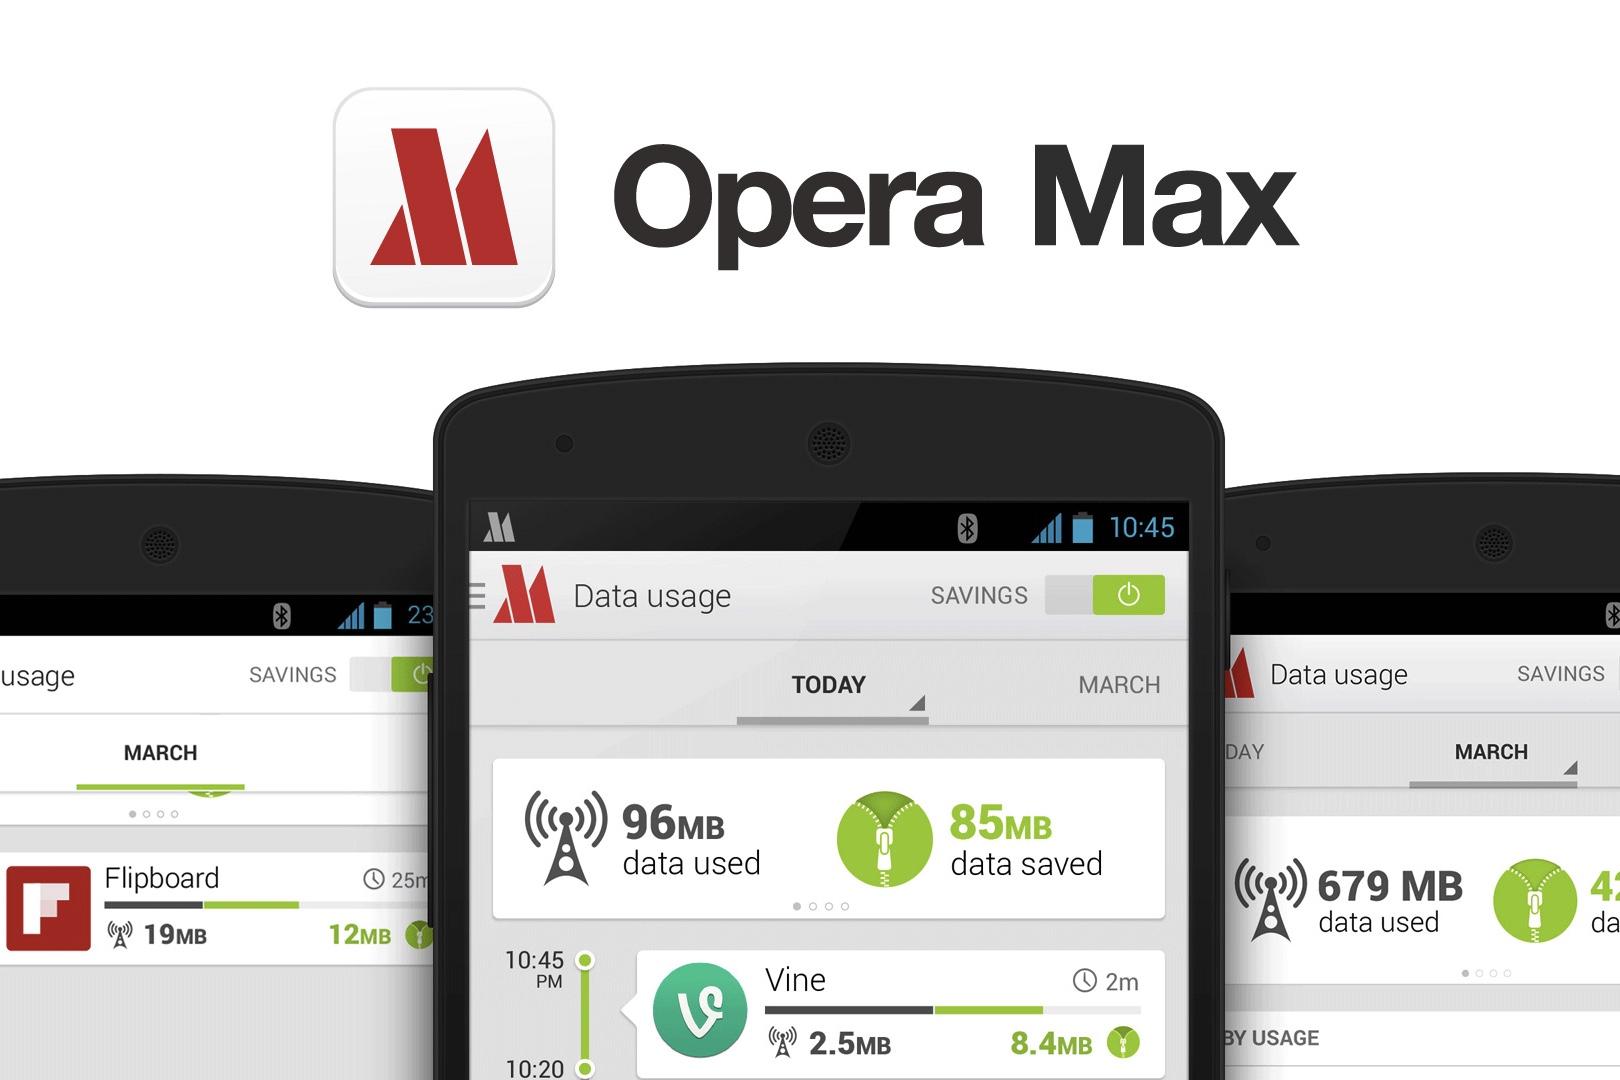 Opera Mini,Opera,Opera Max,Mobapp,News,Apps,Mobapp.mobi,